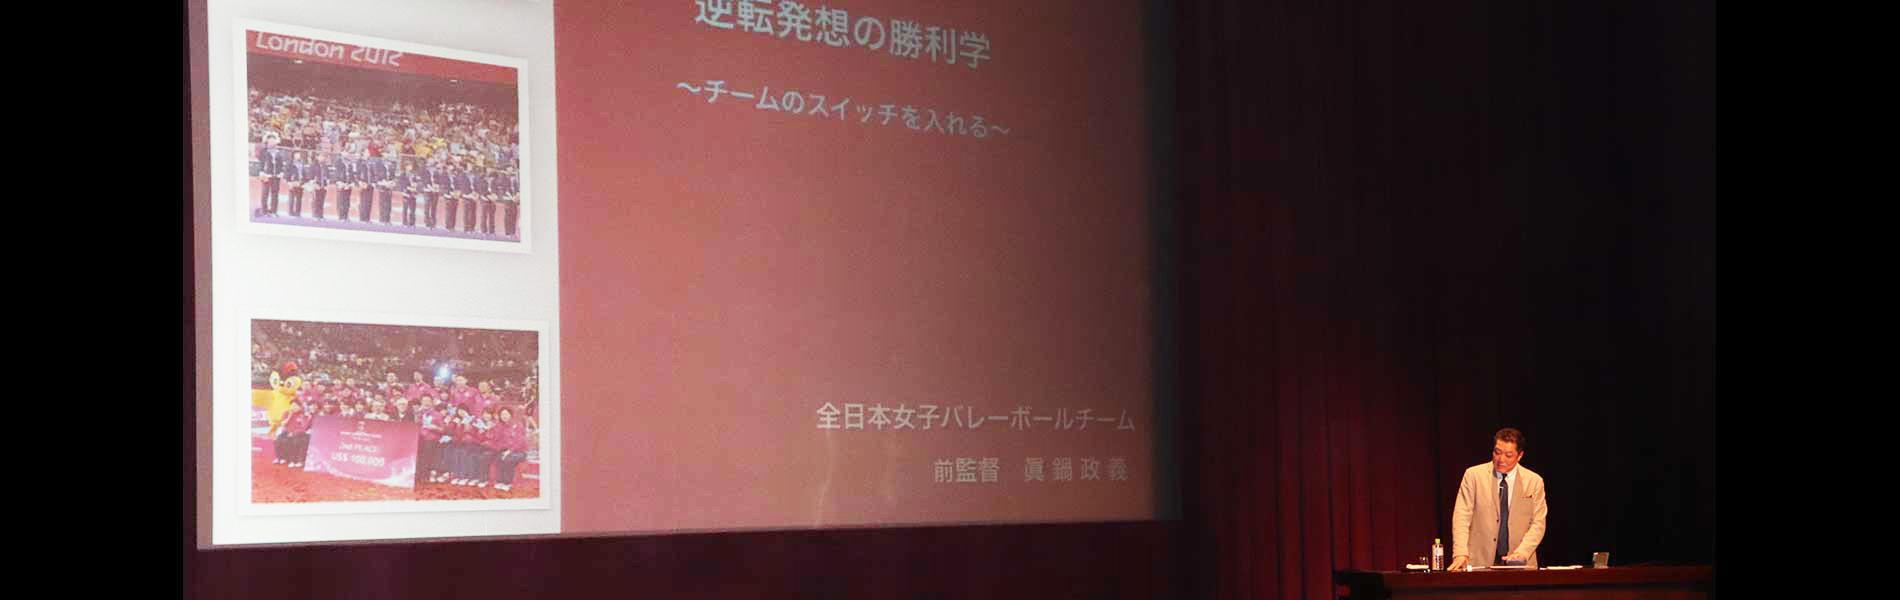 平成30年度 スポーツ講演会